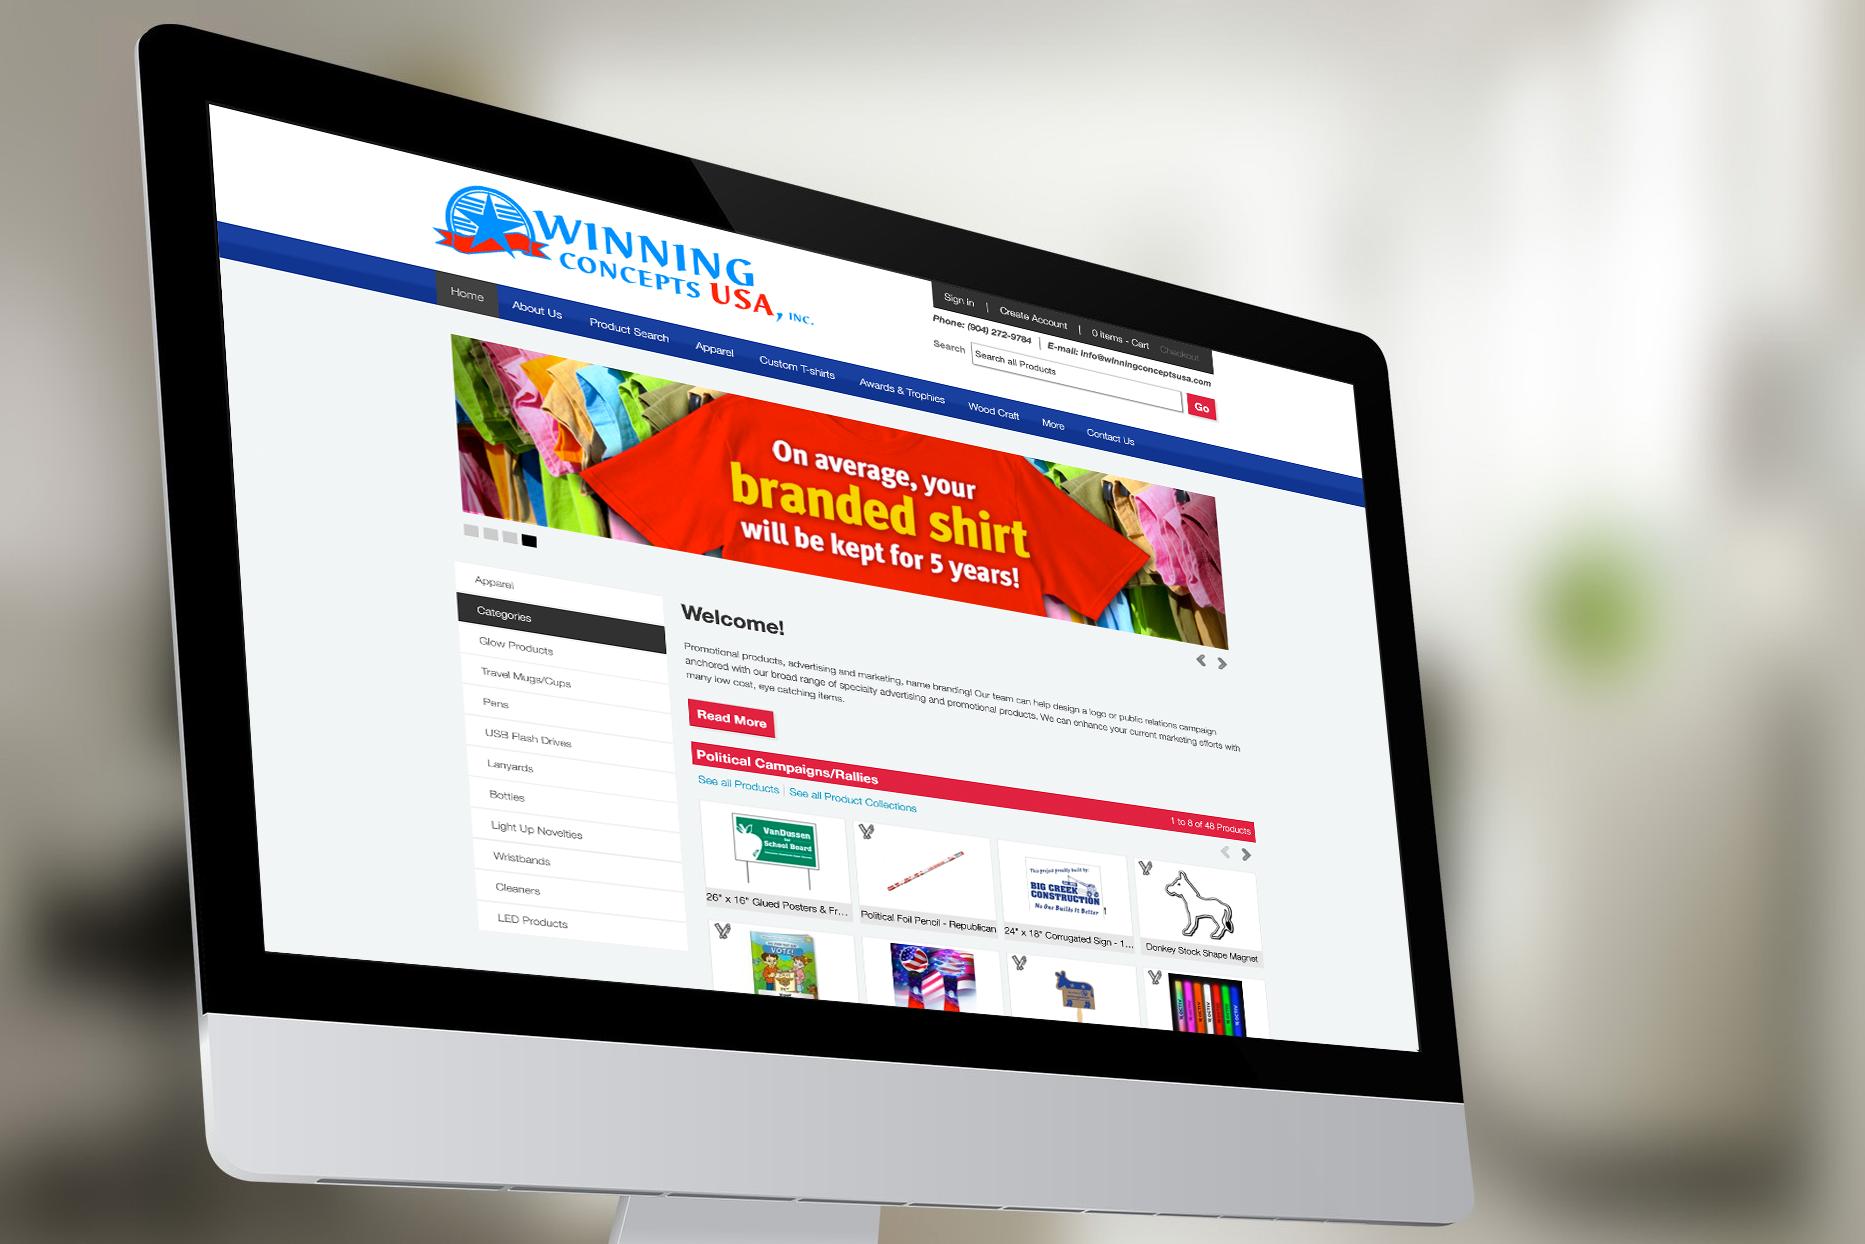 Winning Concepts USA Website